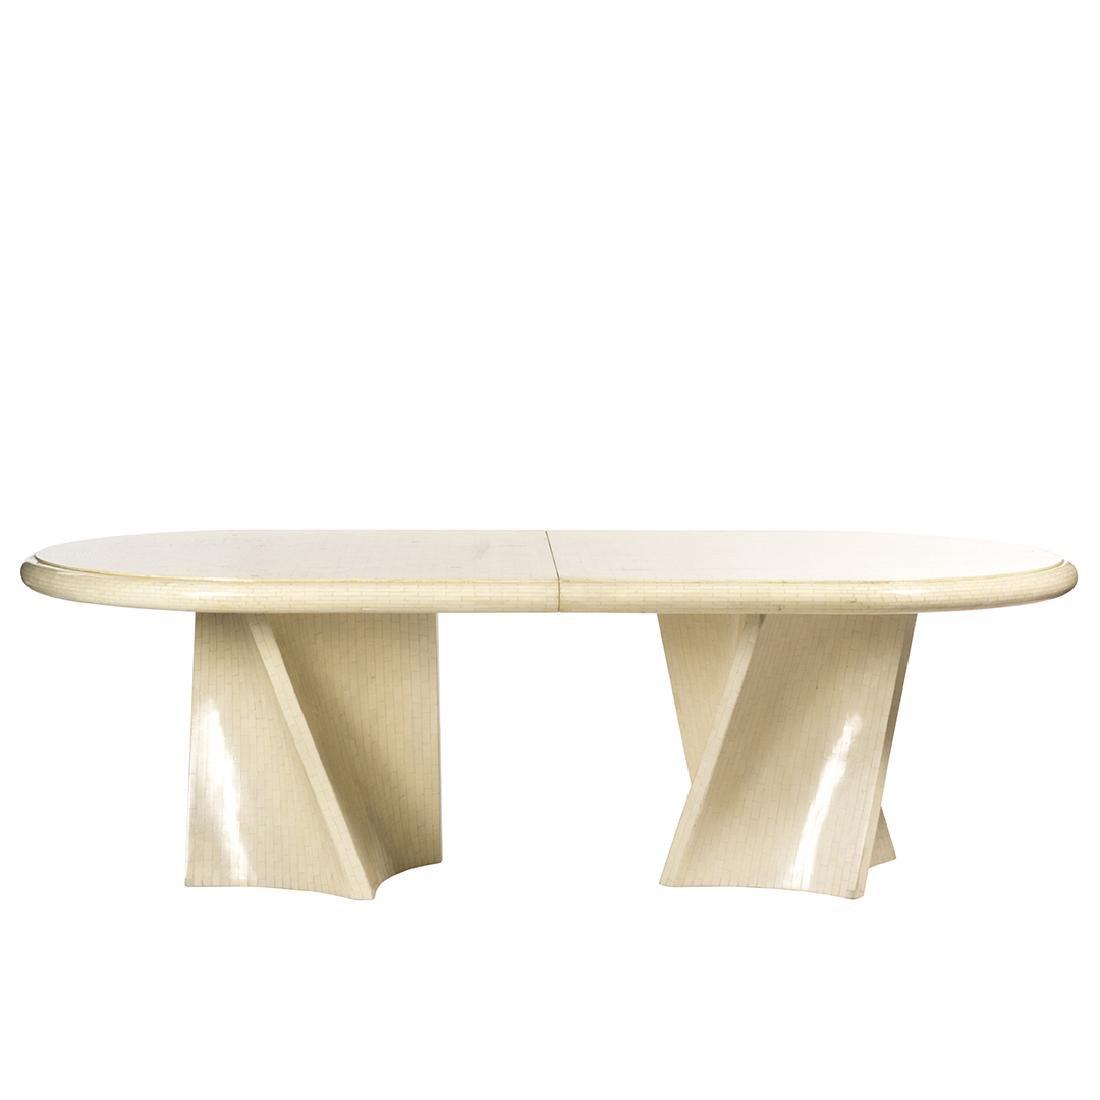 Karl Springer Style Dining Table